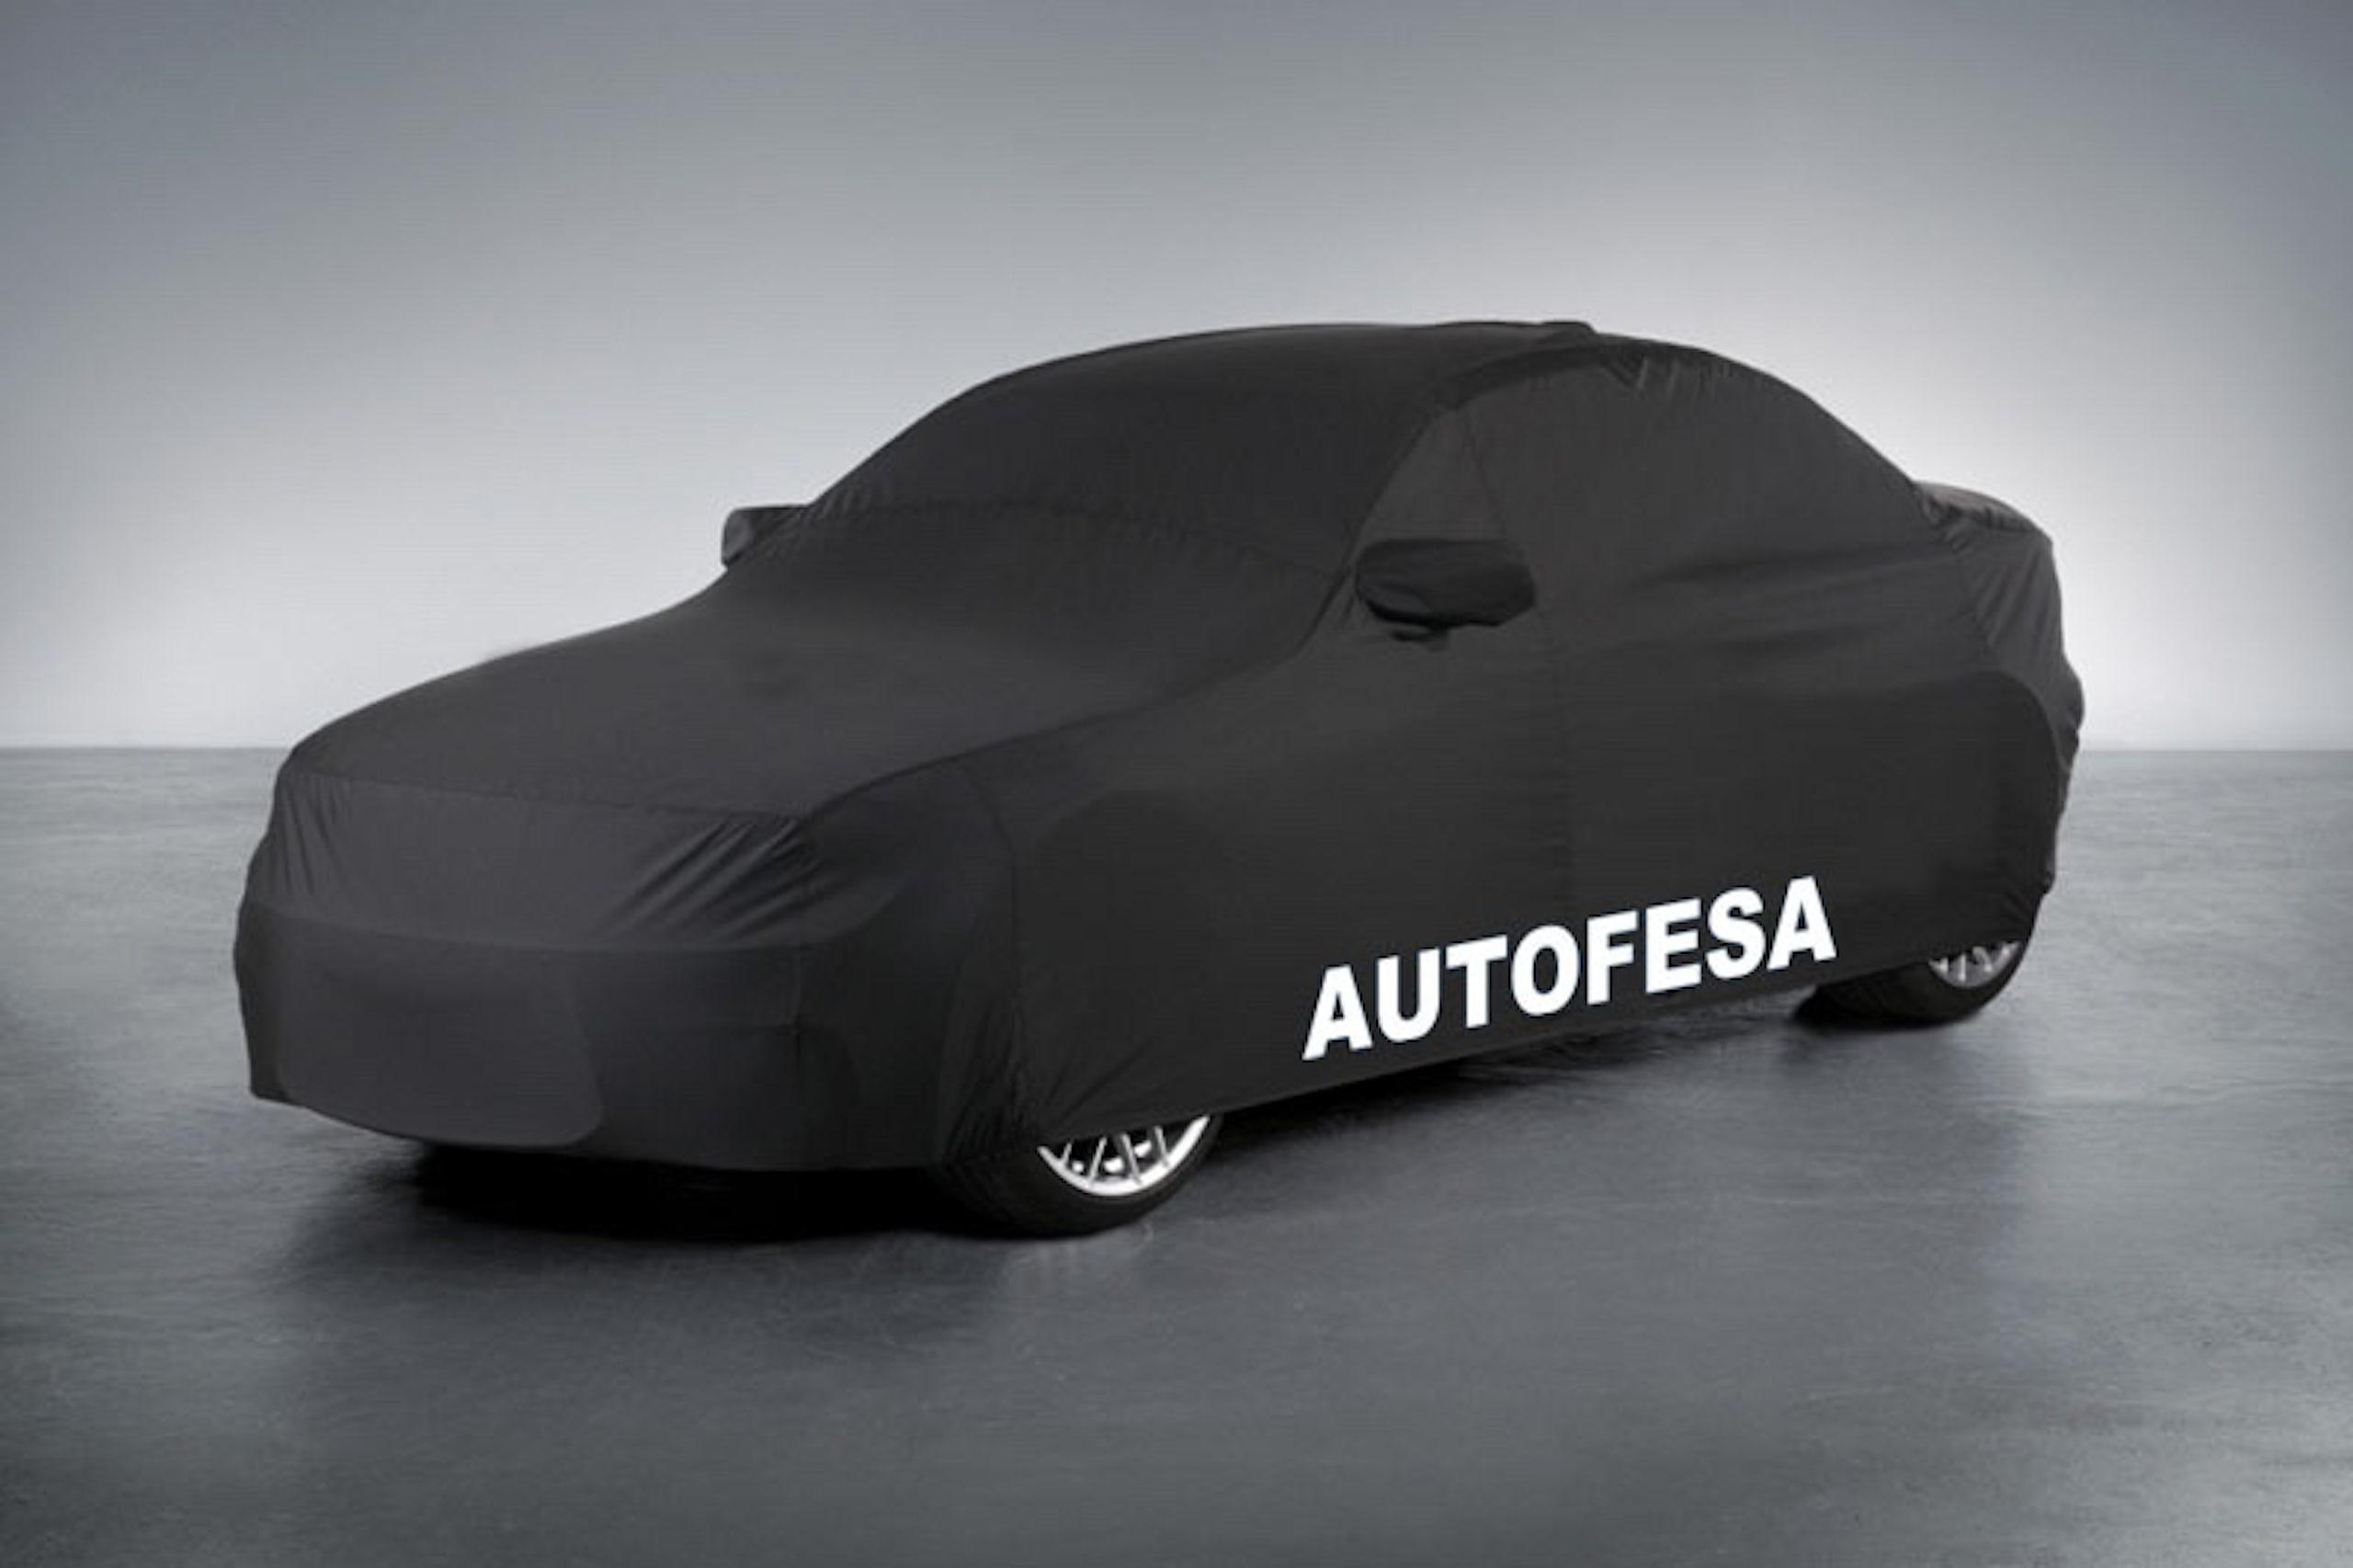 Audi A4 Avant 1.8 TFSi 150cv 5p S/S - Foto 1